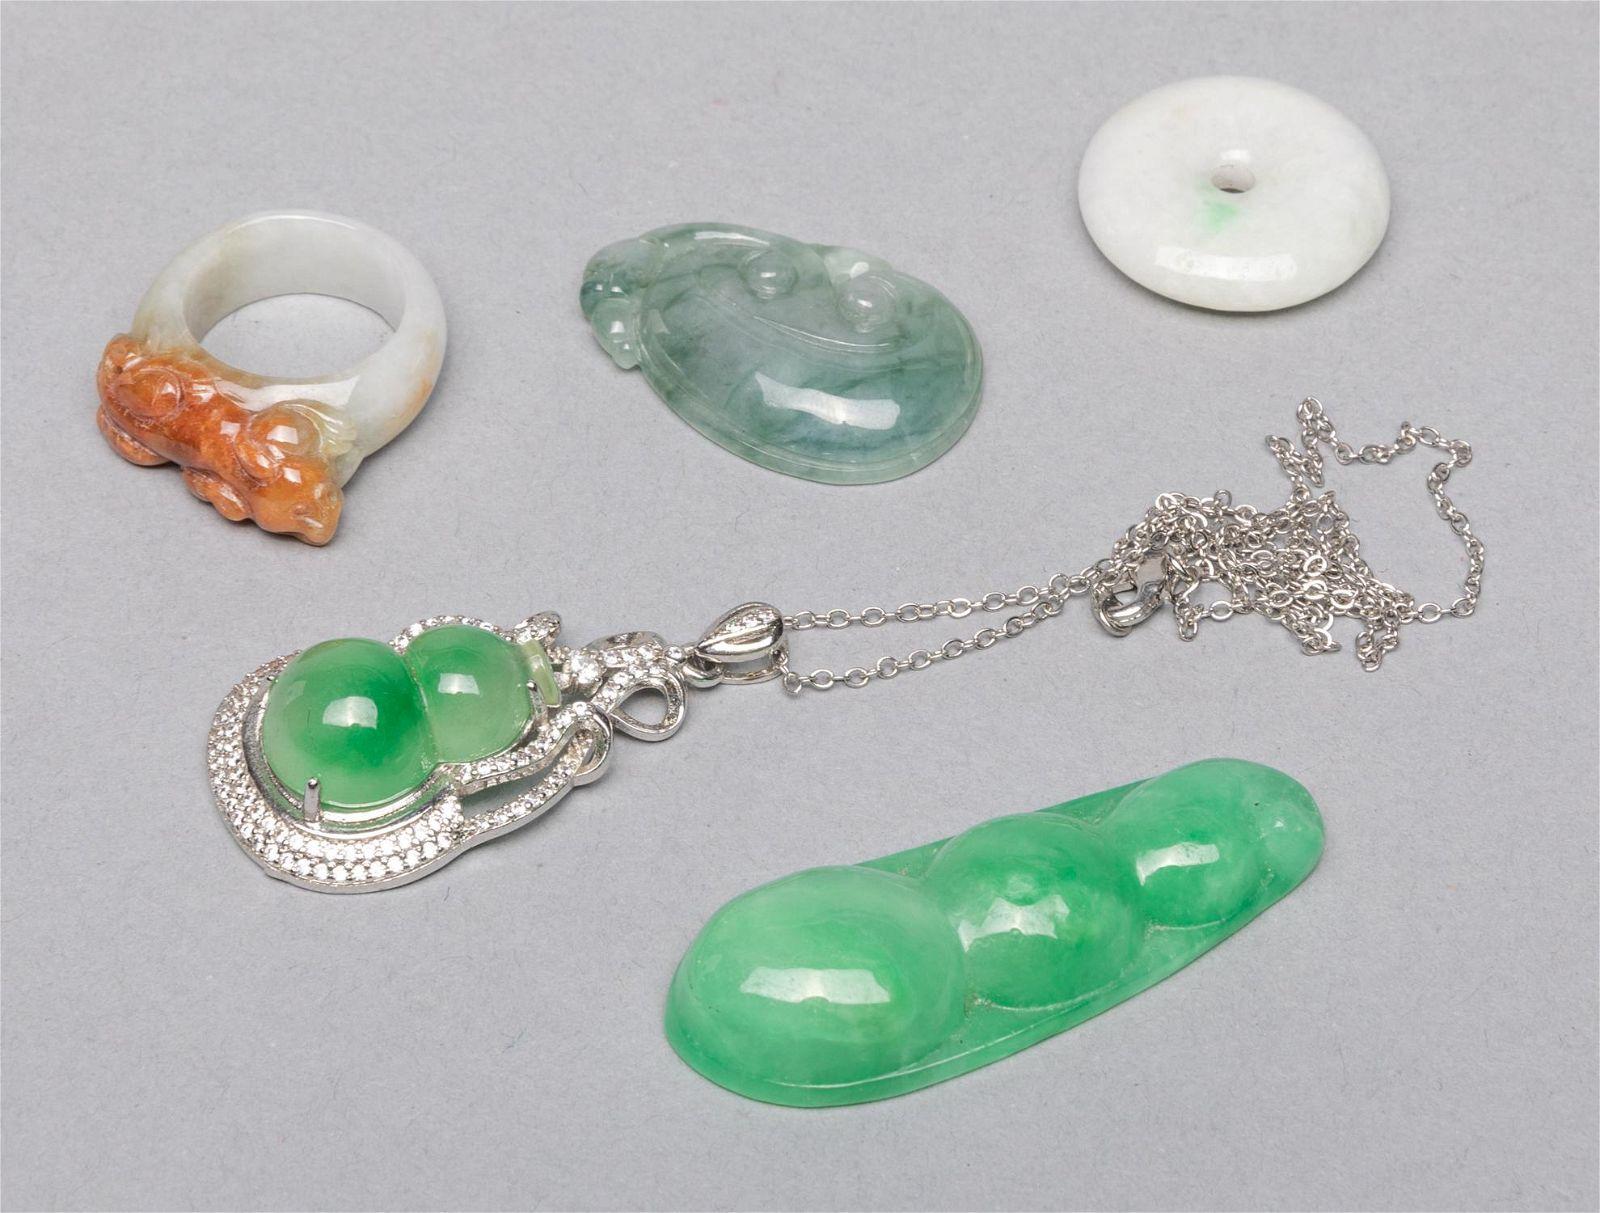 Group Chinese Export Jade Jadeite Stone Toggles